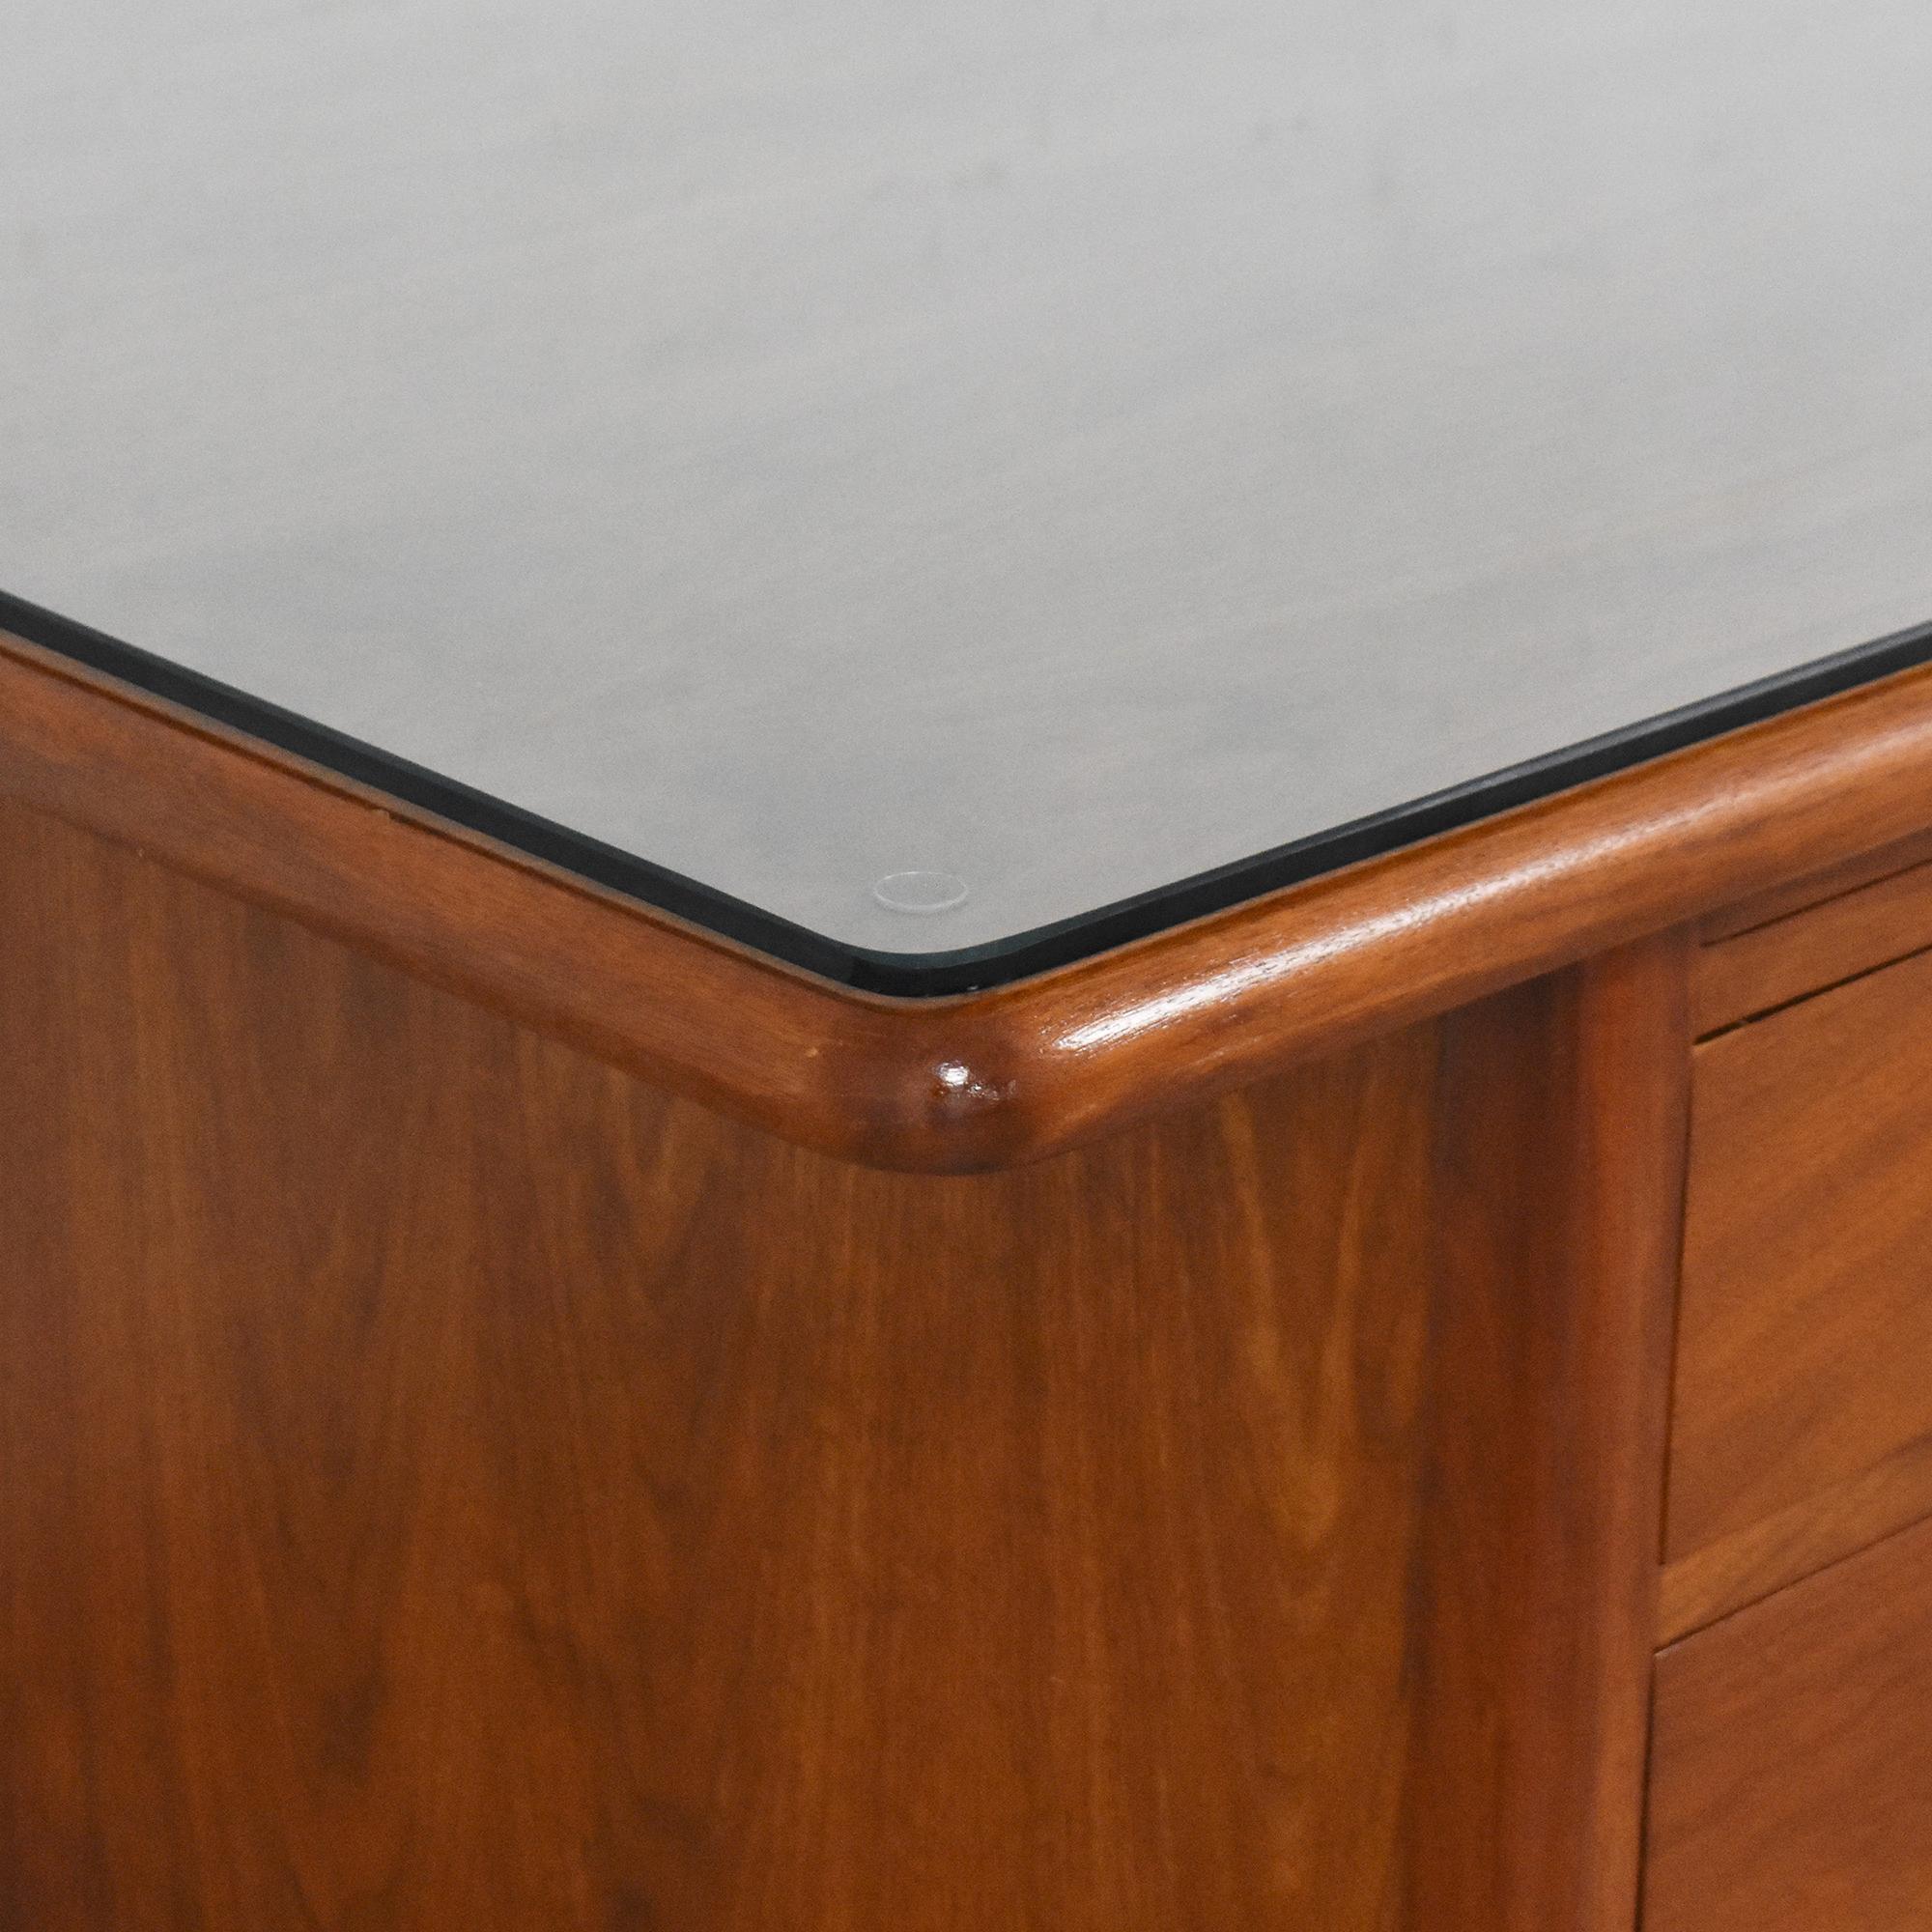 buy Hoosier Desk Co. Hoosier Desk Co. Vintage Executive Desk online